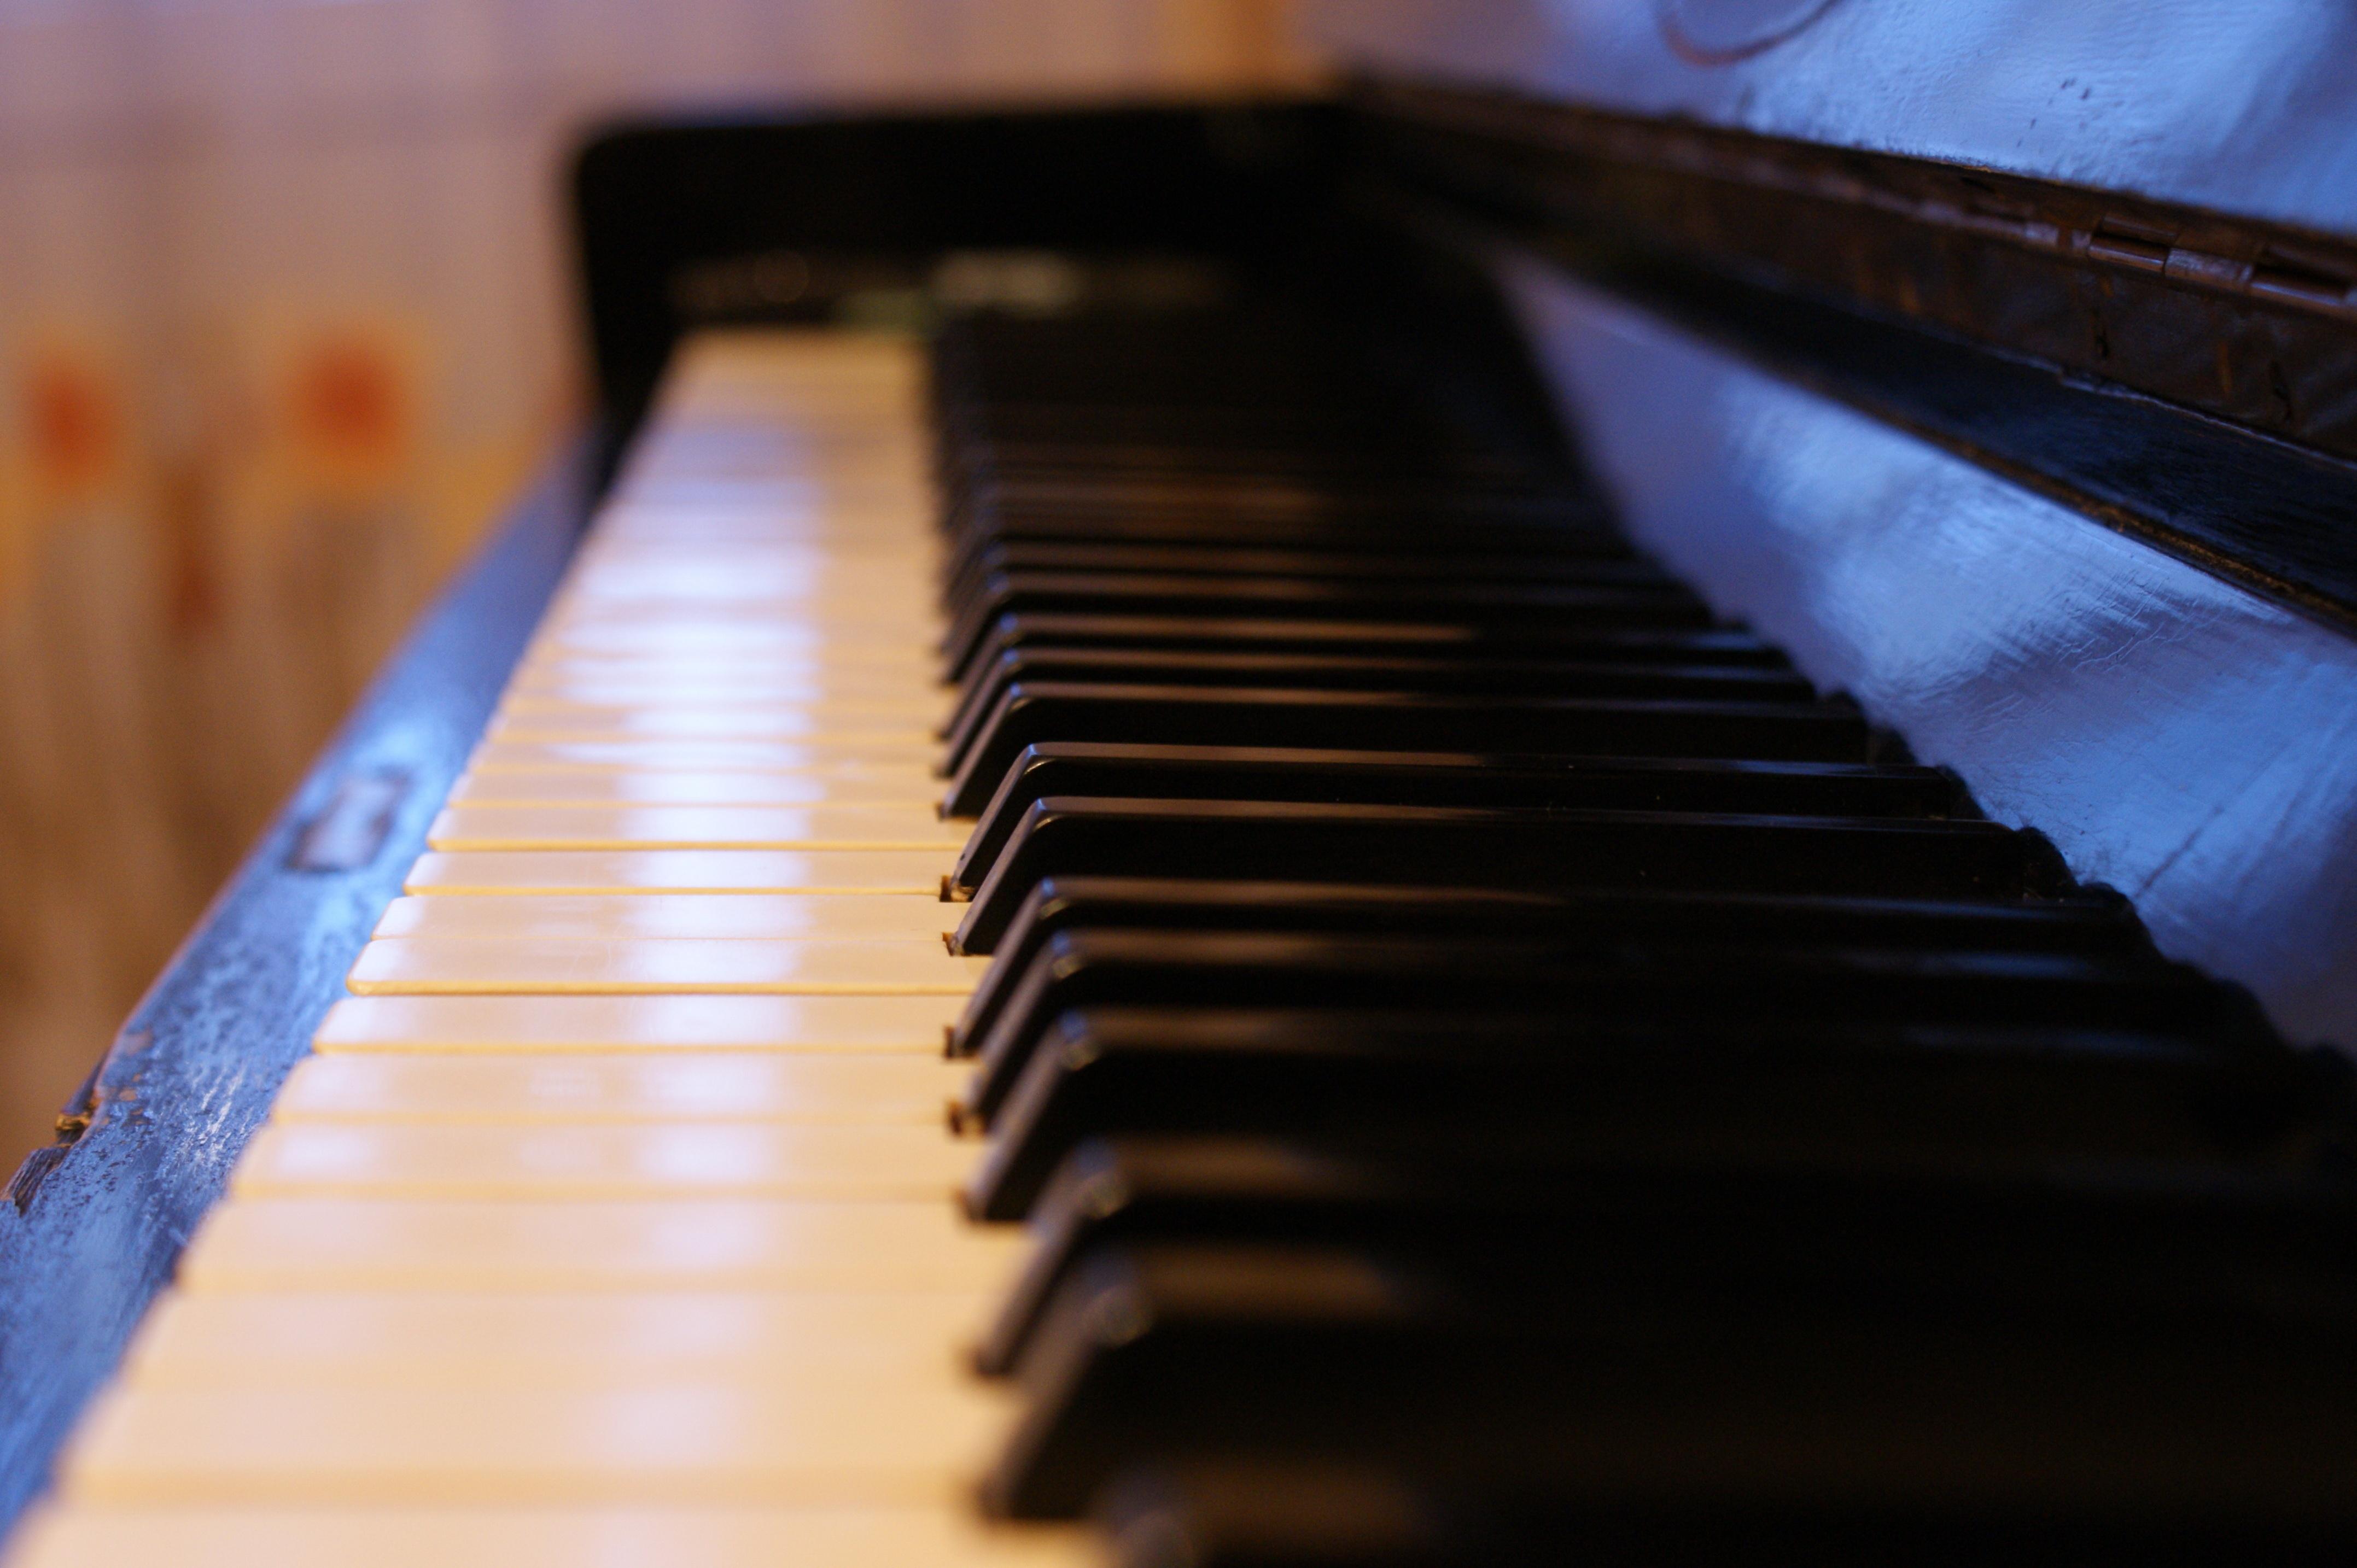 Piano Wallpaper Desktop